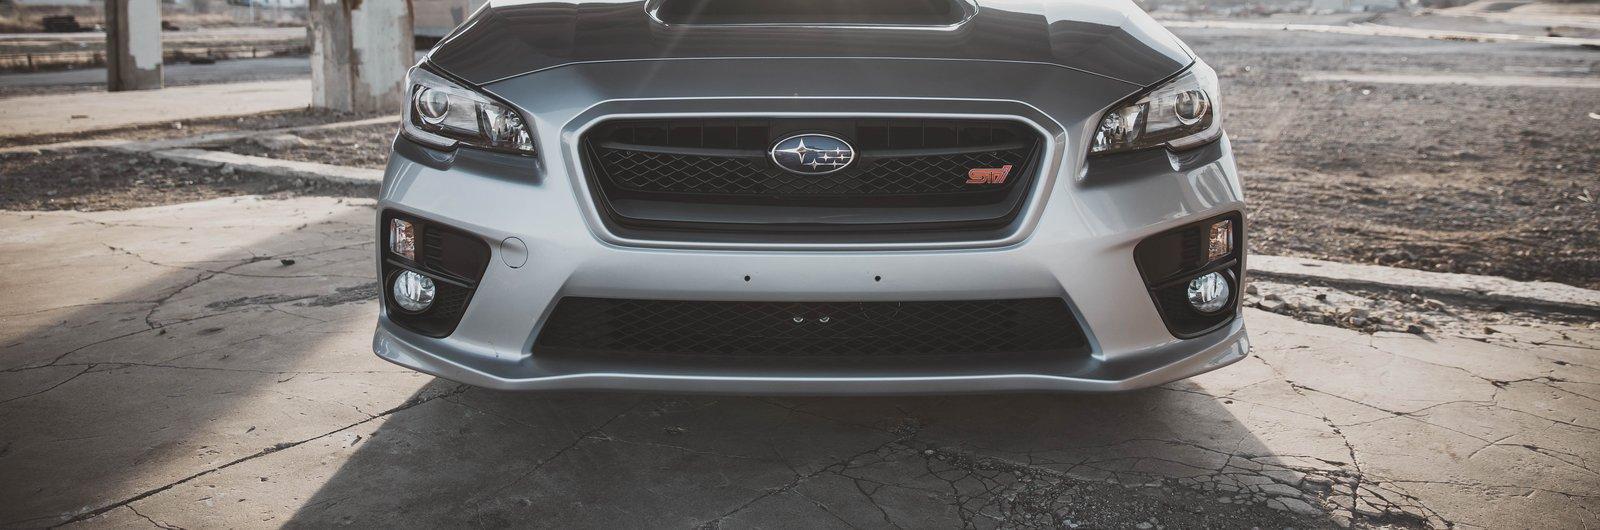 Subaru Rental | Experience Luxury Style with Sixt